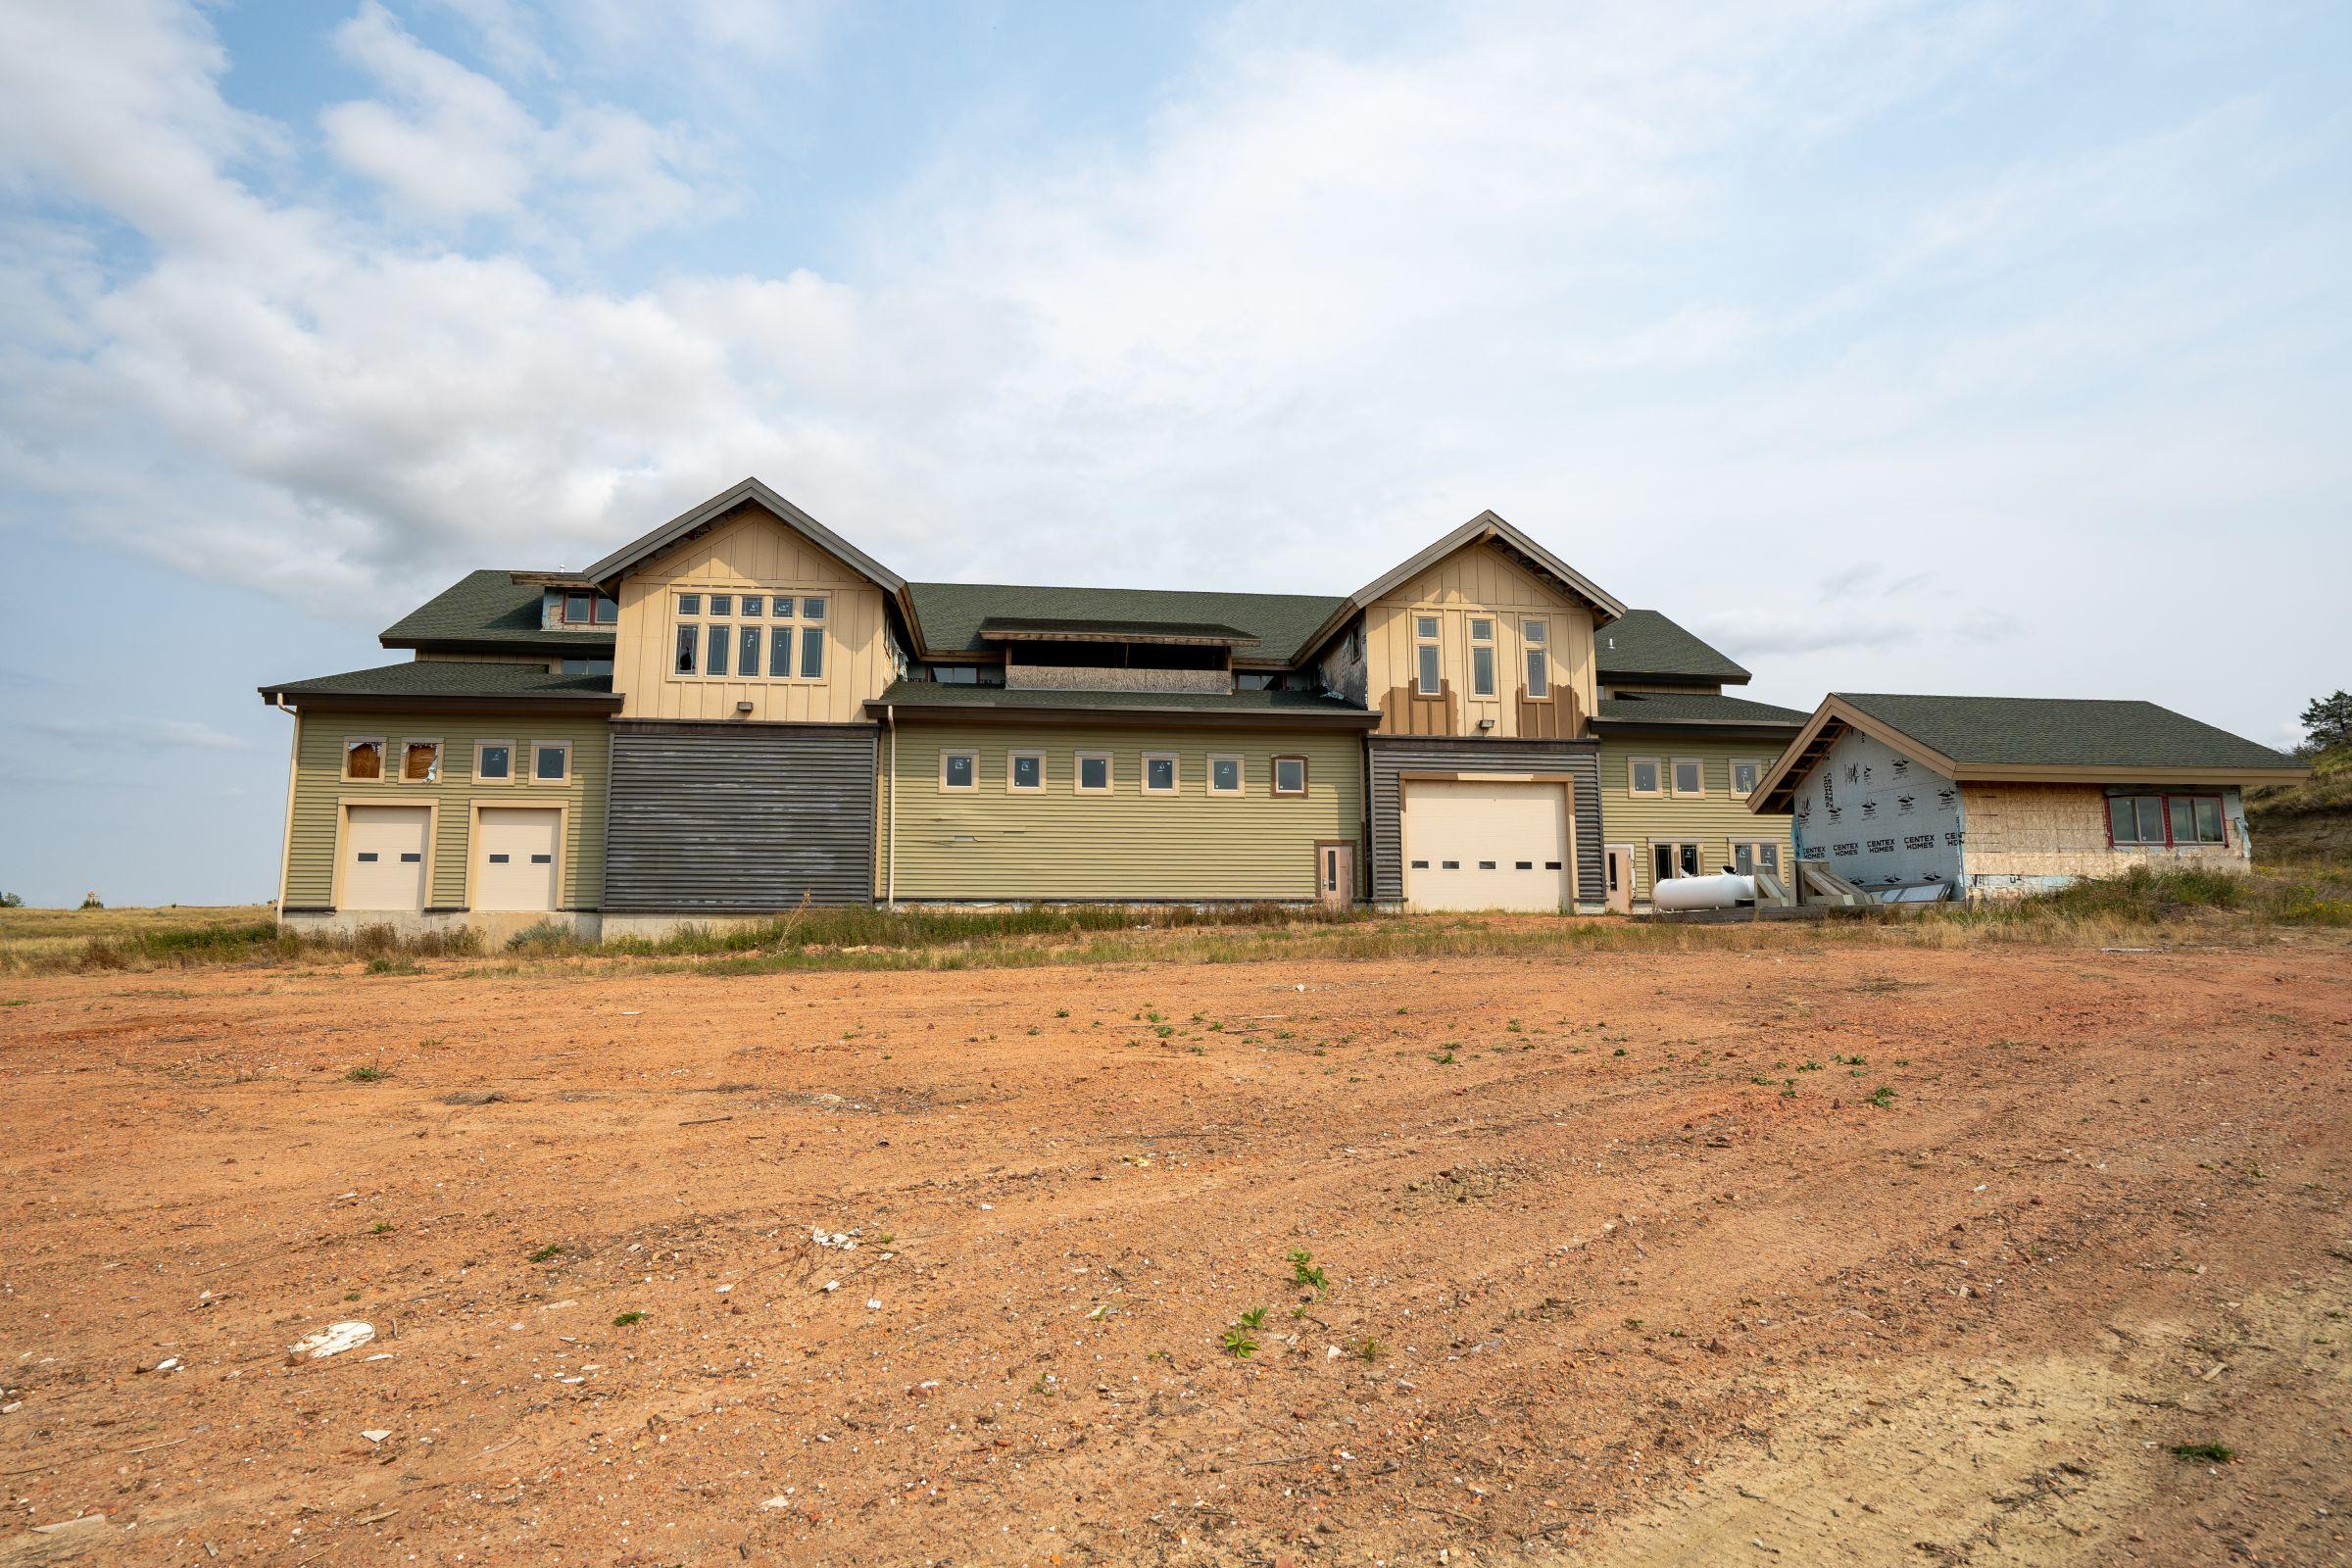 auctions-land-mckenzie-county-north-dakota-270-acres-listing-number-15735-3-2021-09-10-124716.jpeg